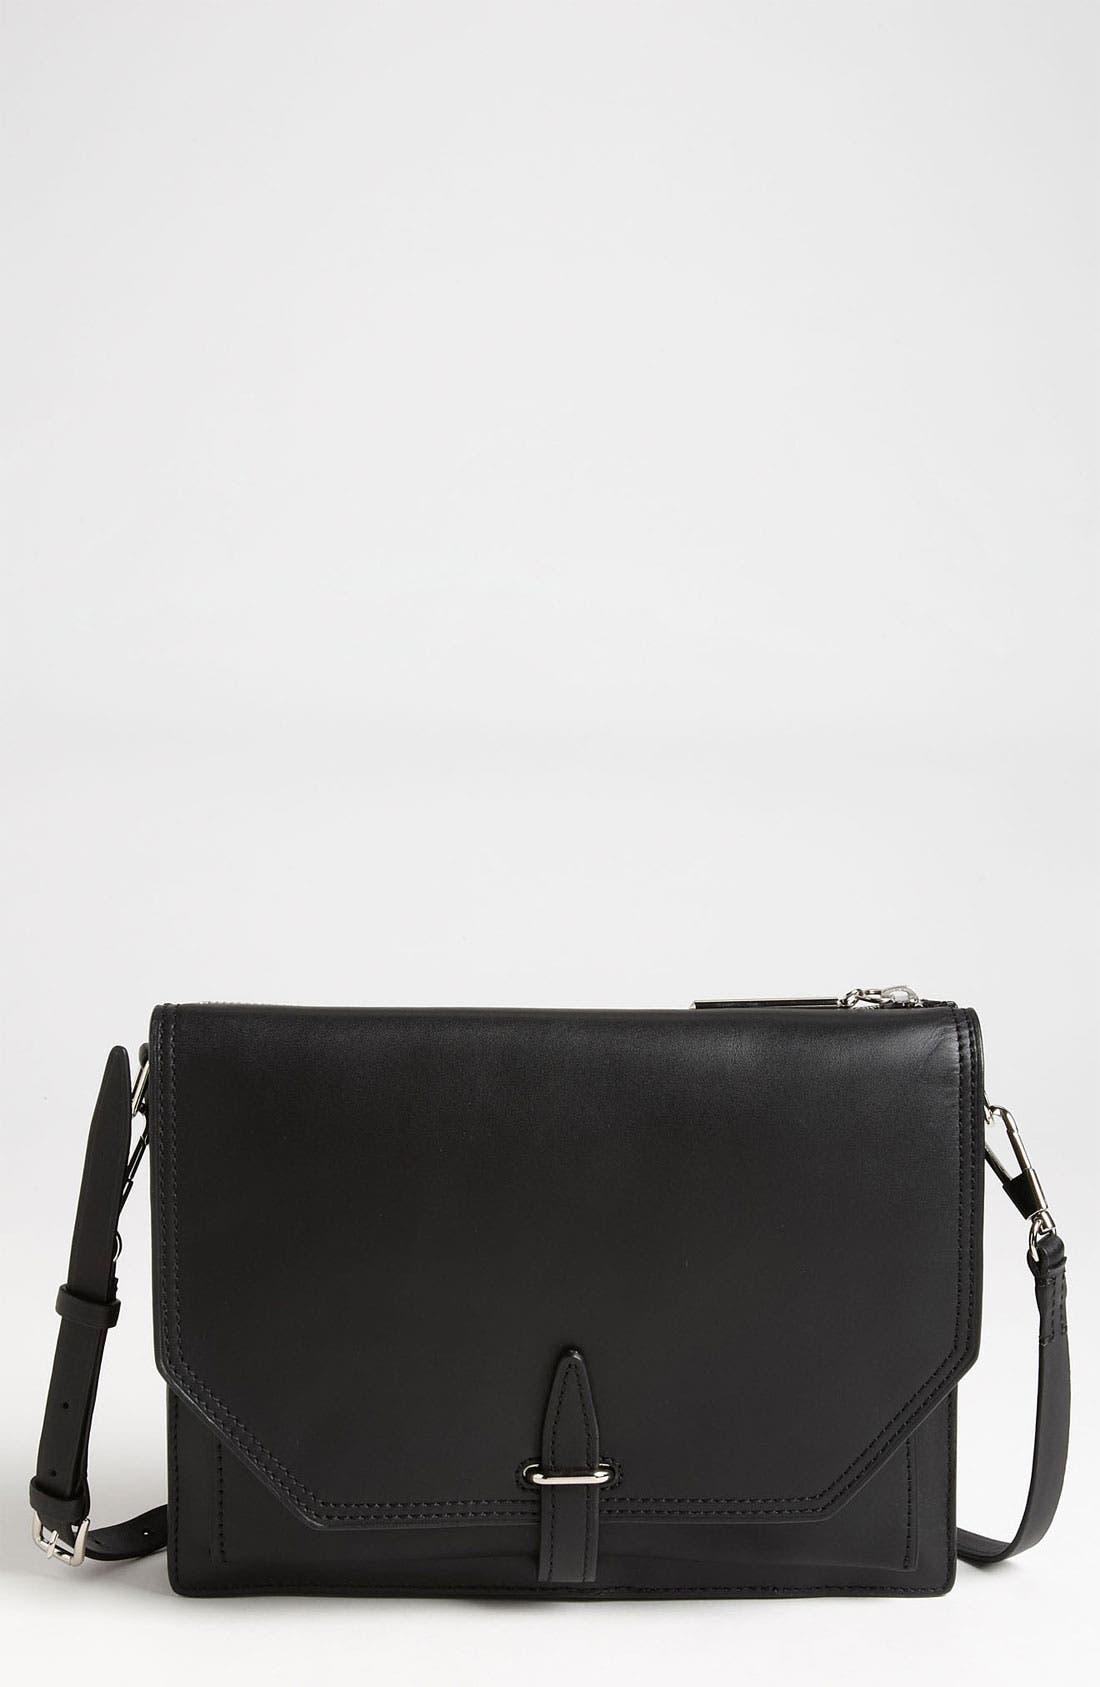 Main Image - 3.1 Phillip Lim Leather Crossbody Bag